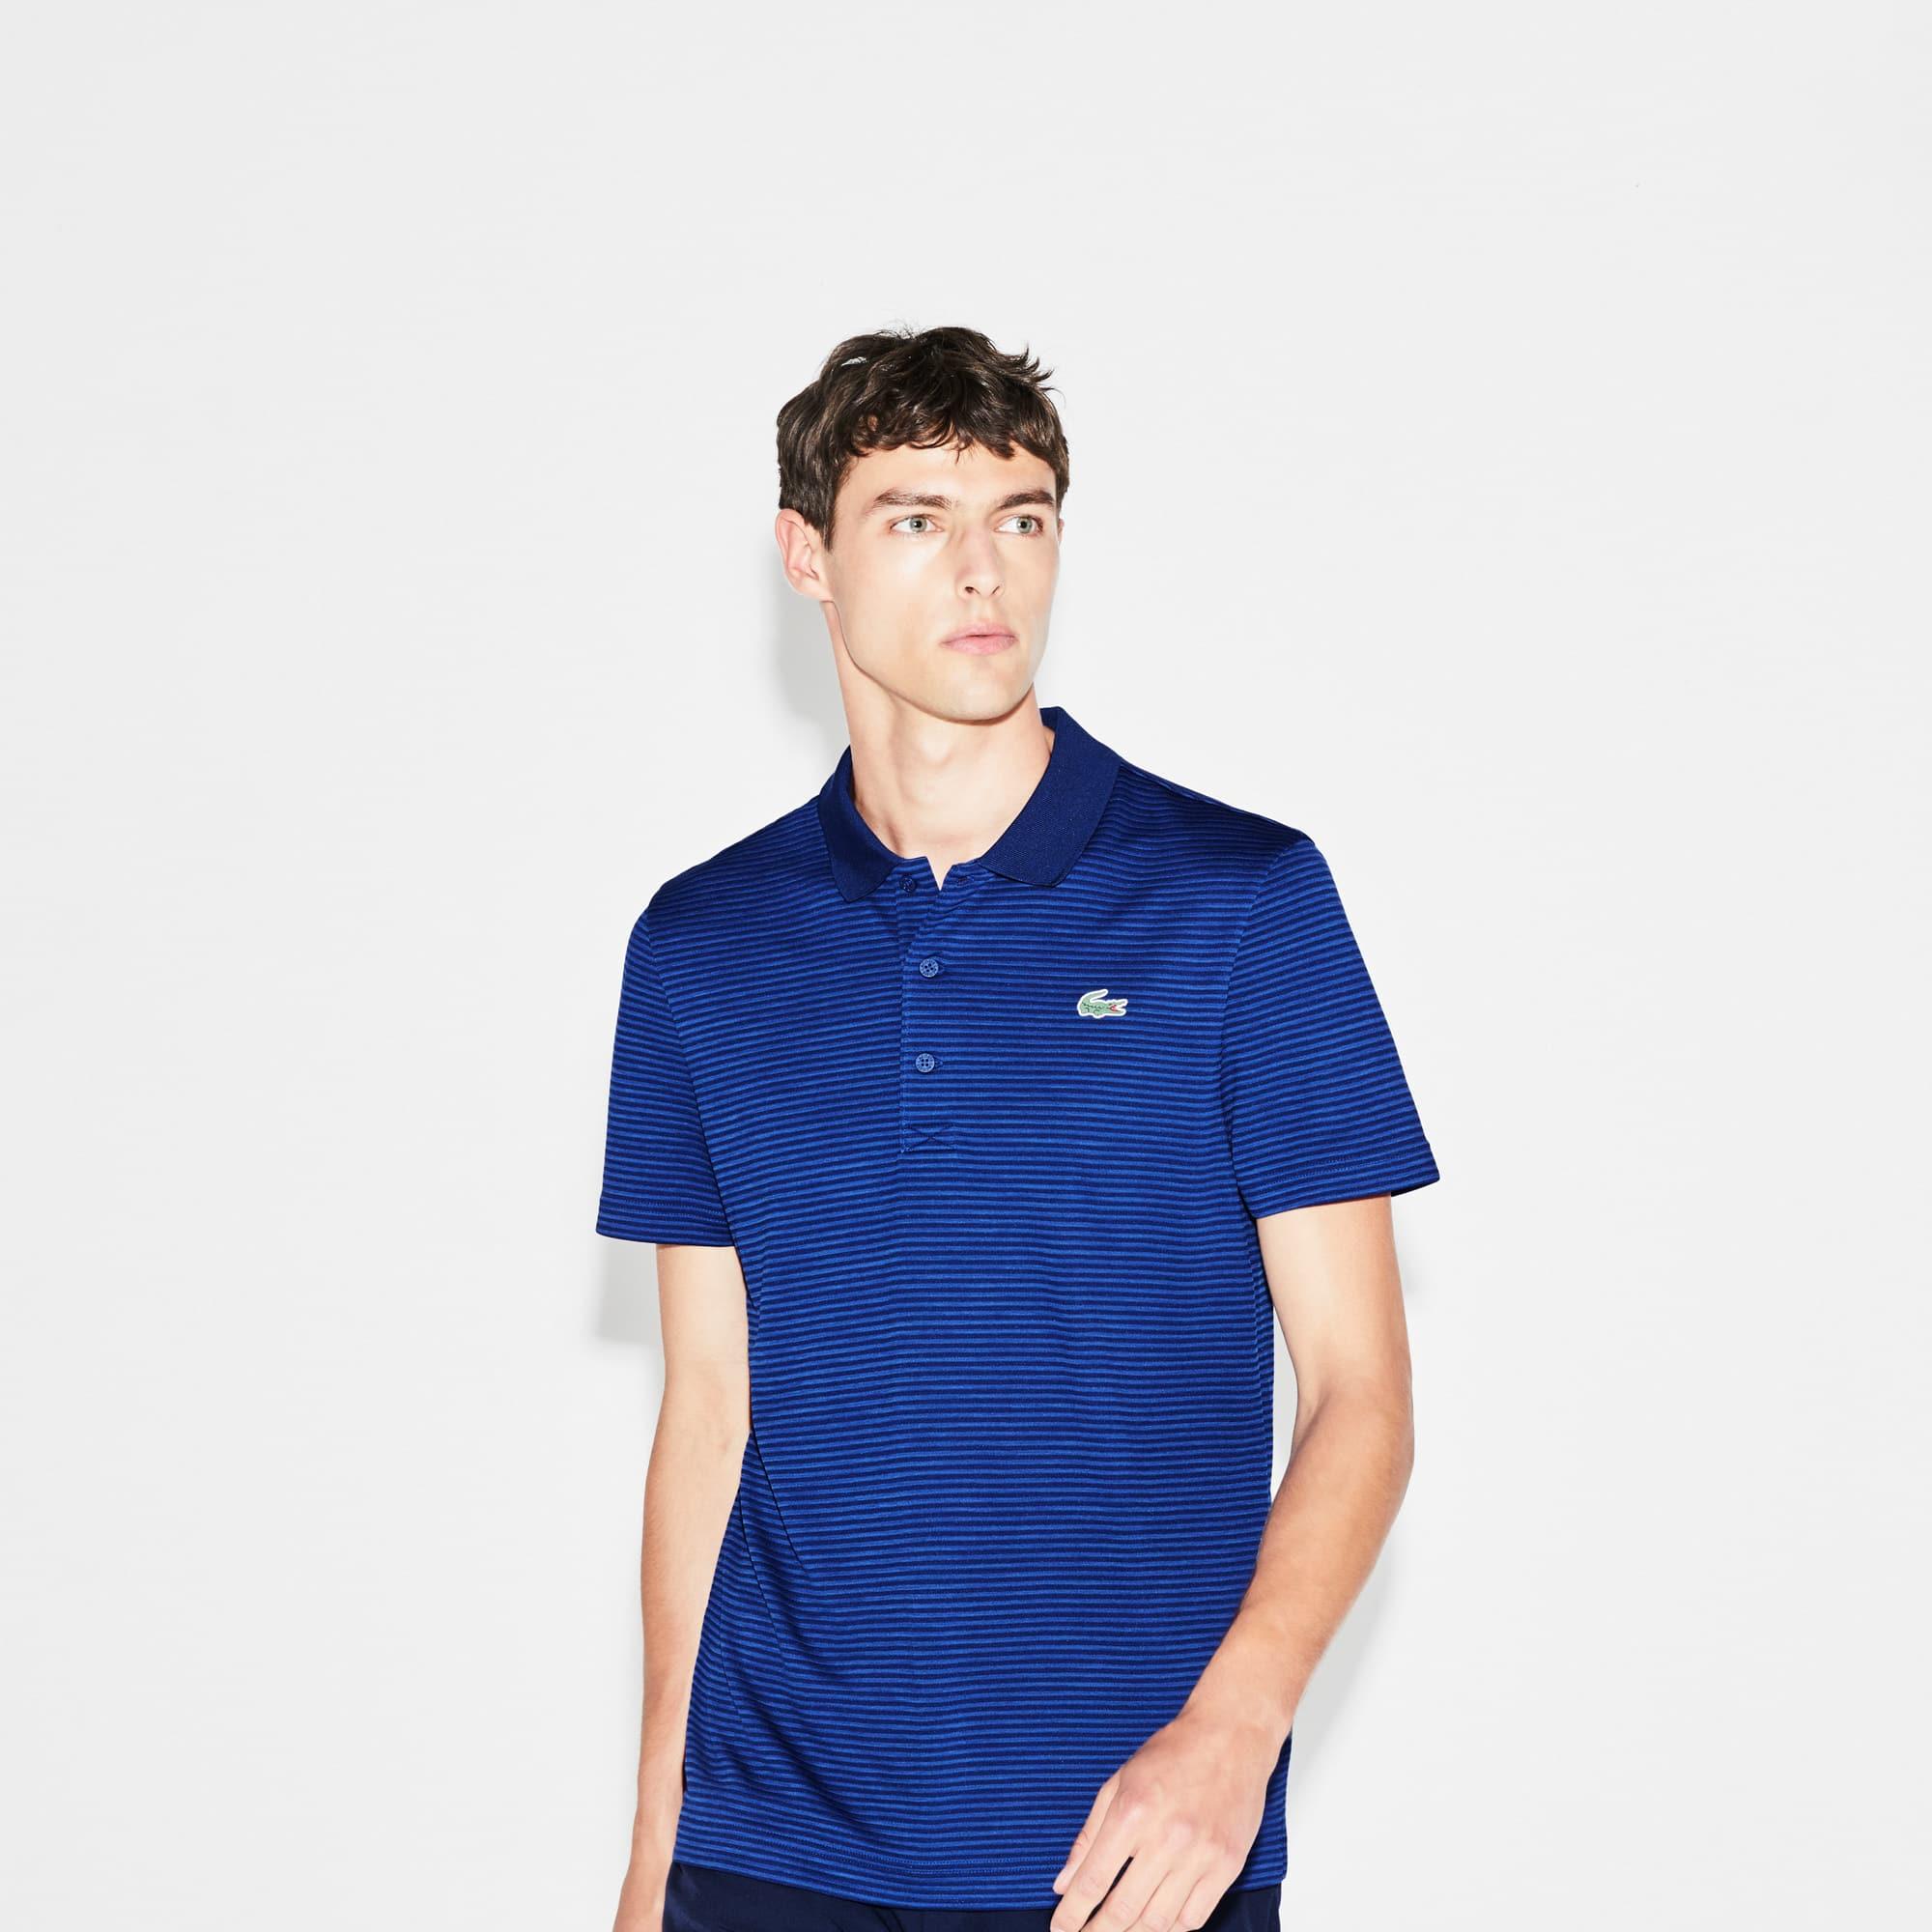 Men's  SPORT Golf Striped Tech Jersey Polo